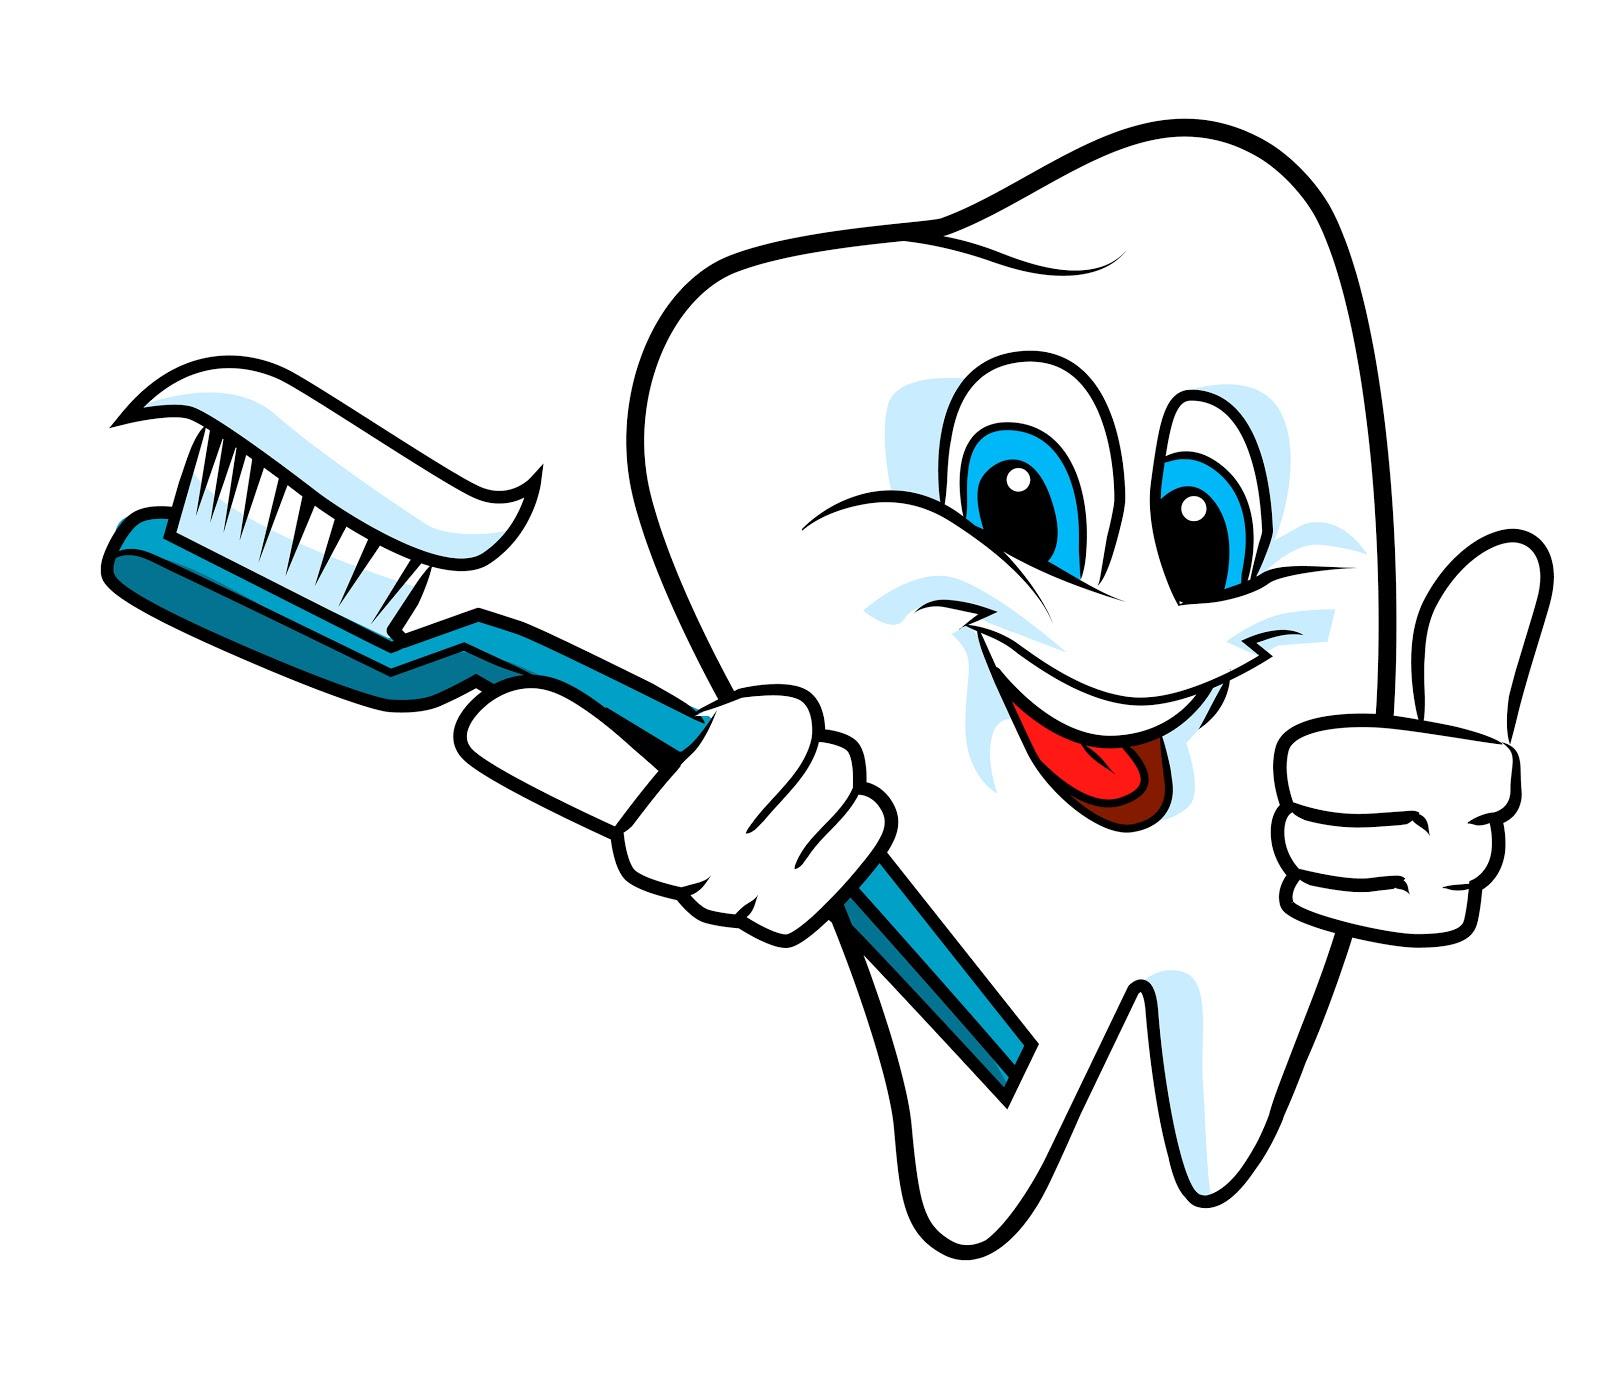 1600x1376 Brush Teeth Brush Your Teeth Clipart Clip Art Library